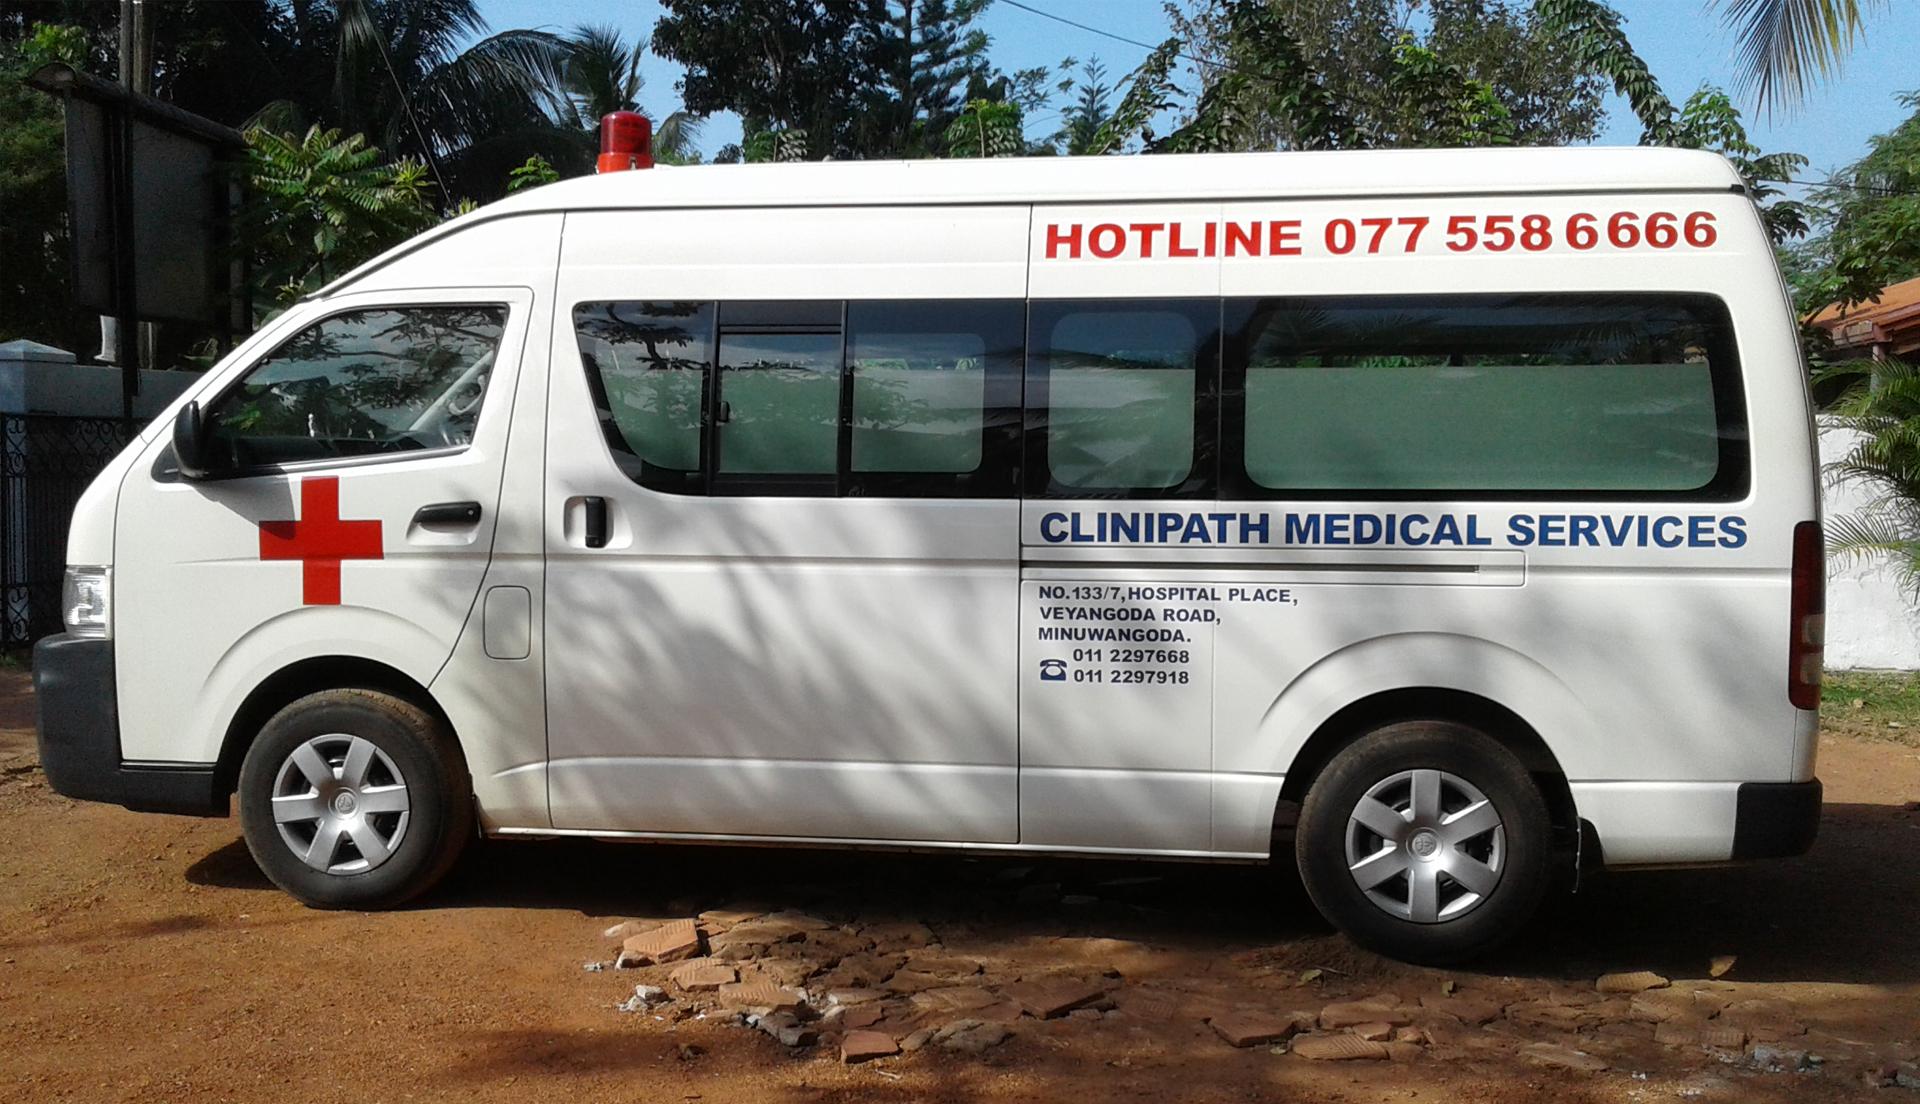 Clinipath Medical Services